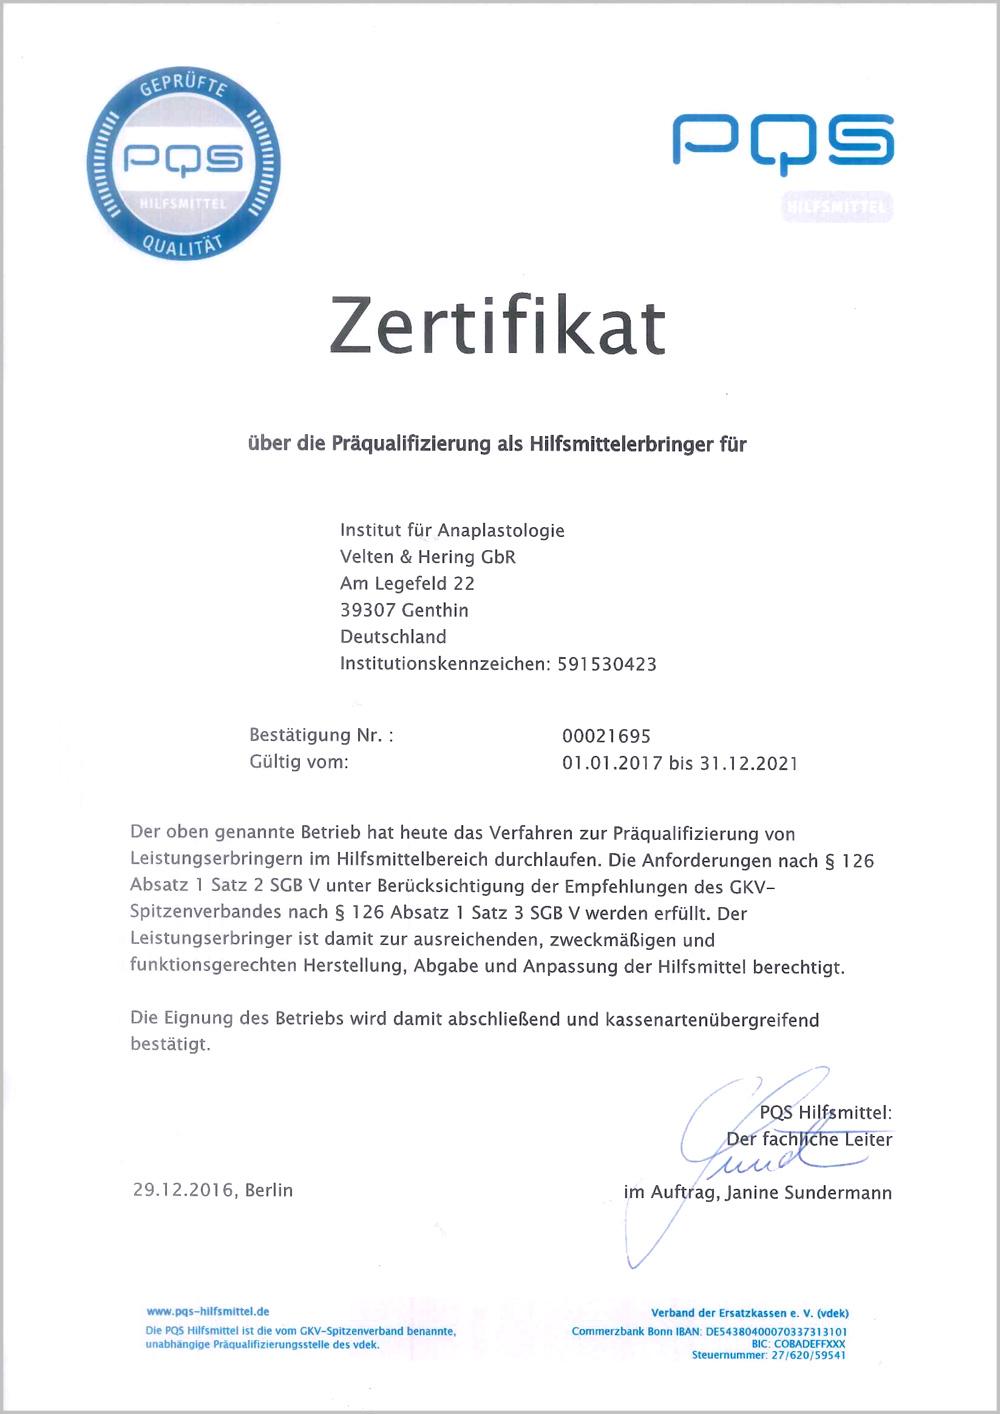 Zertifikat-Präqualifizierung